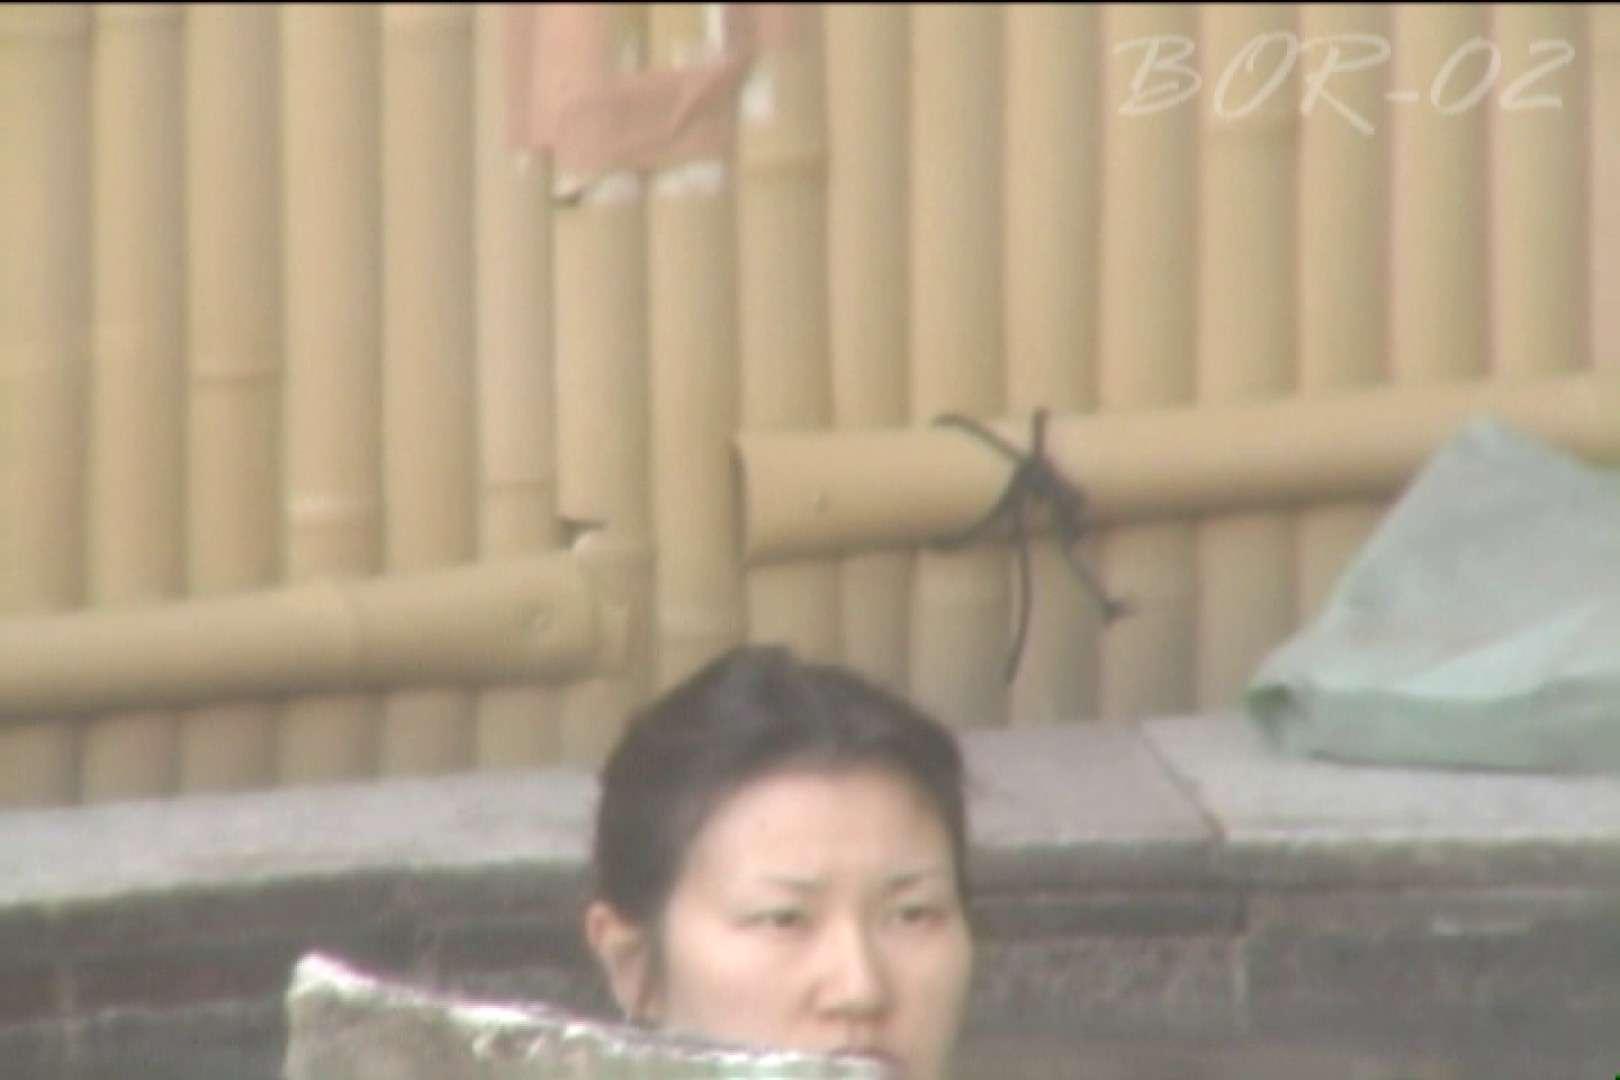 Aquaな露天風呂Vol.476 盗撮 濡れ場動画紹介 80画像 14